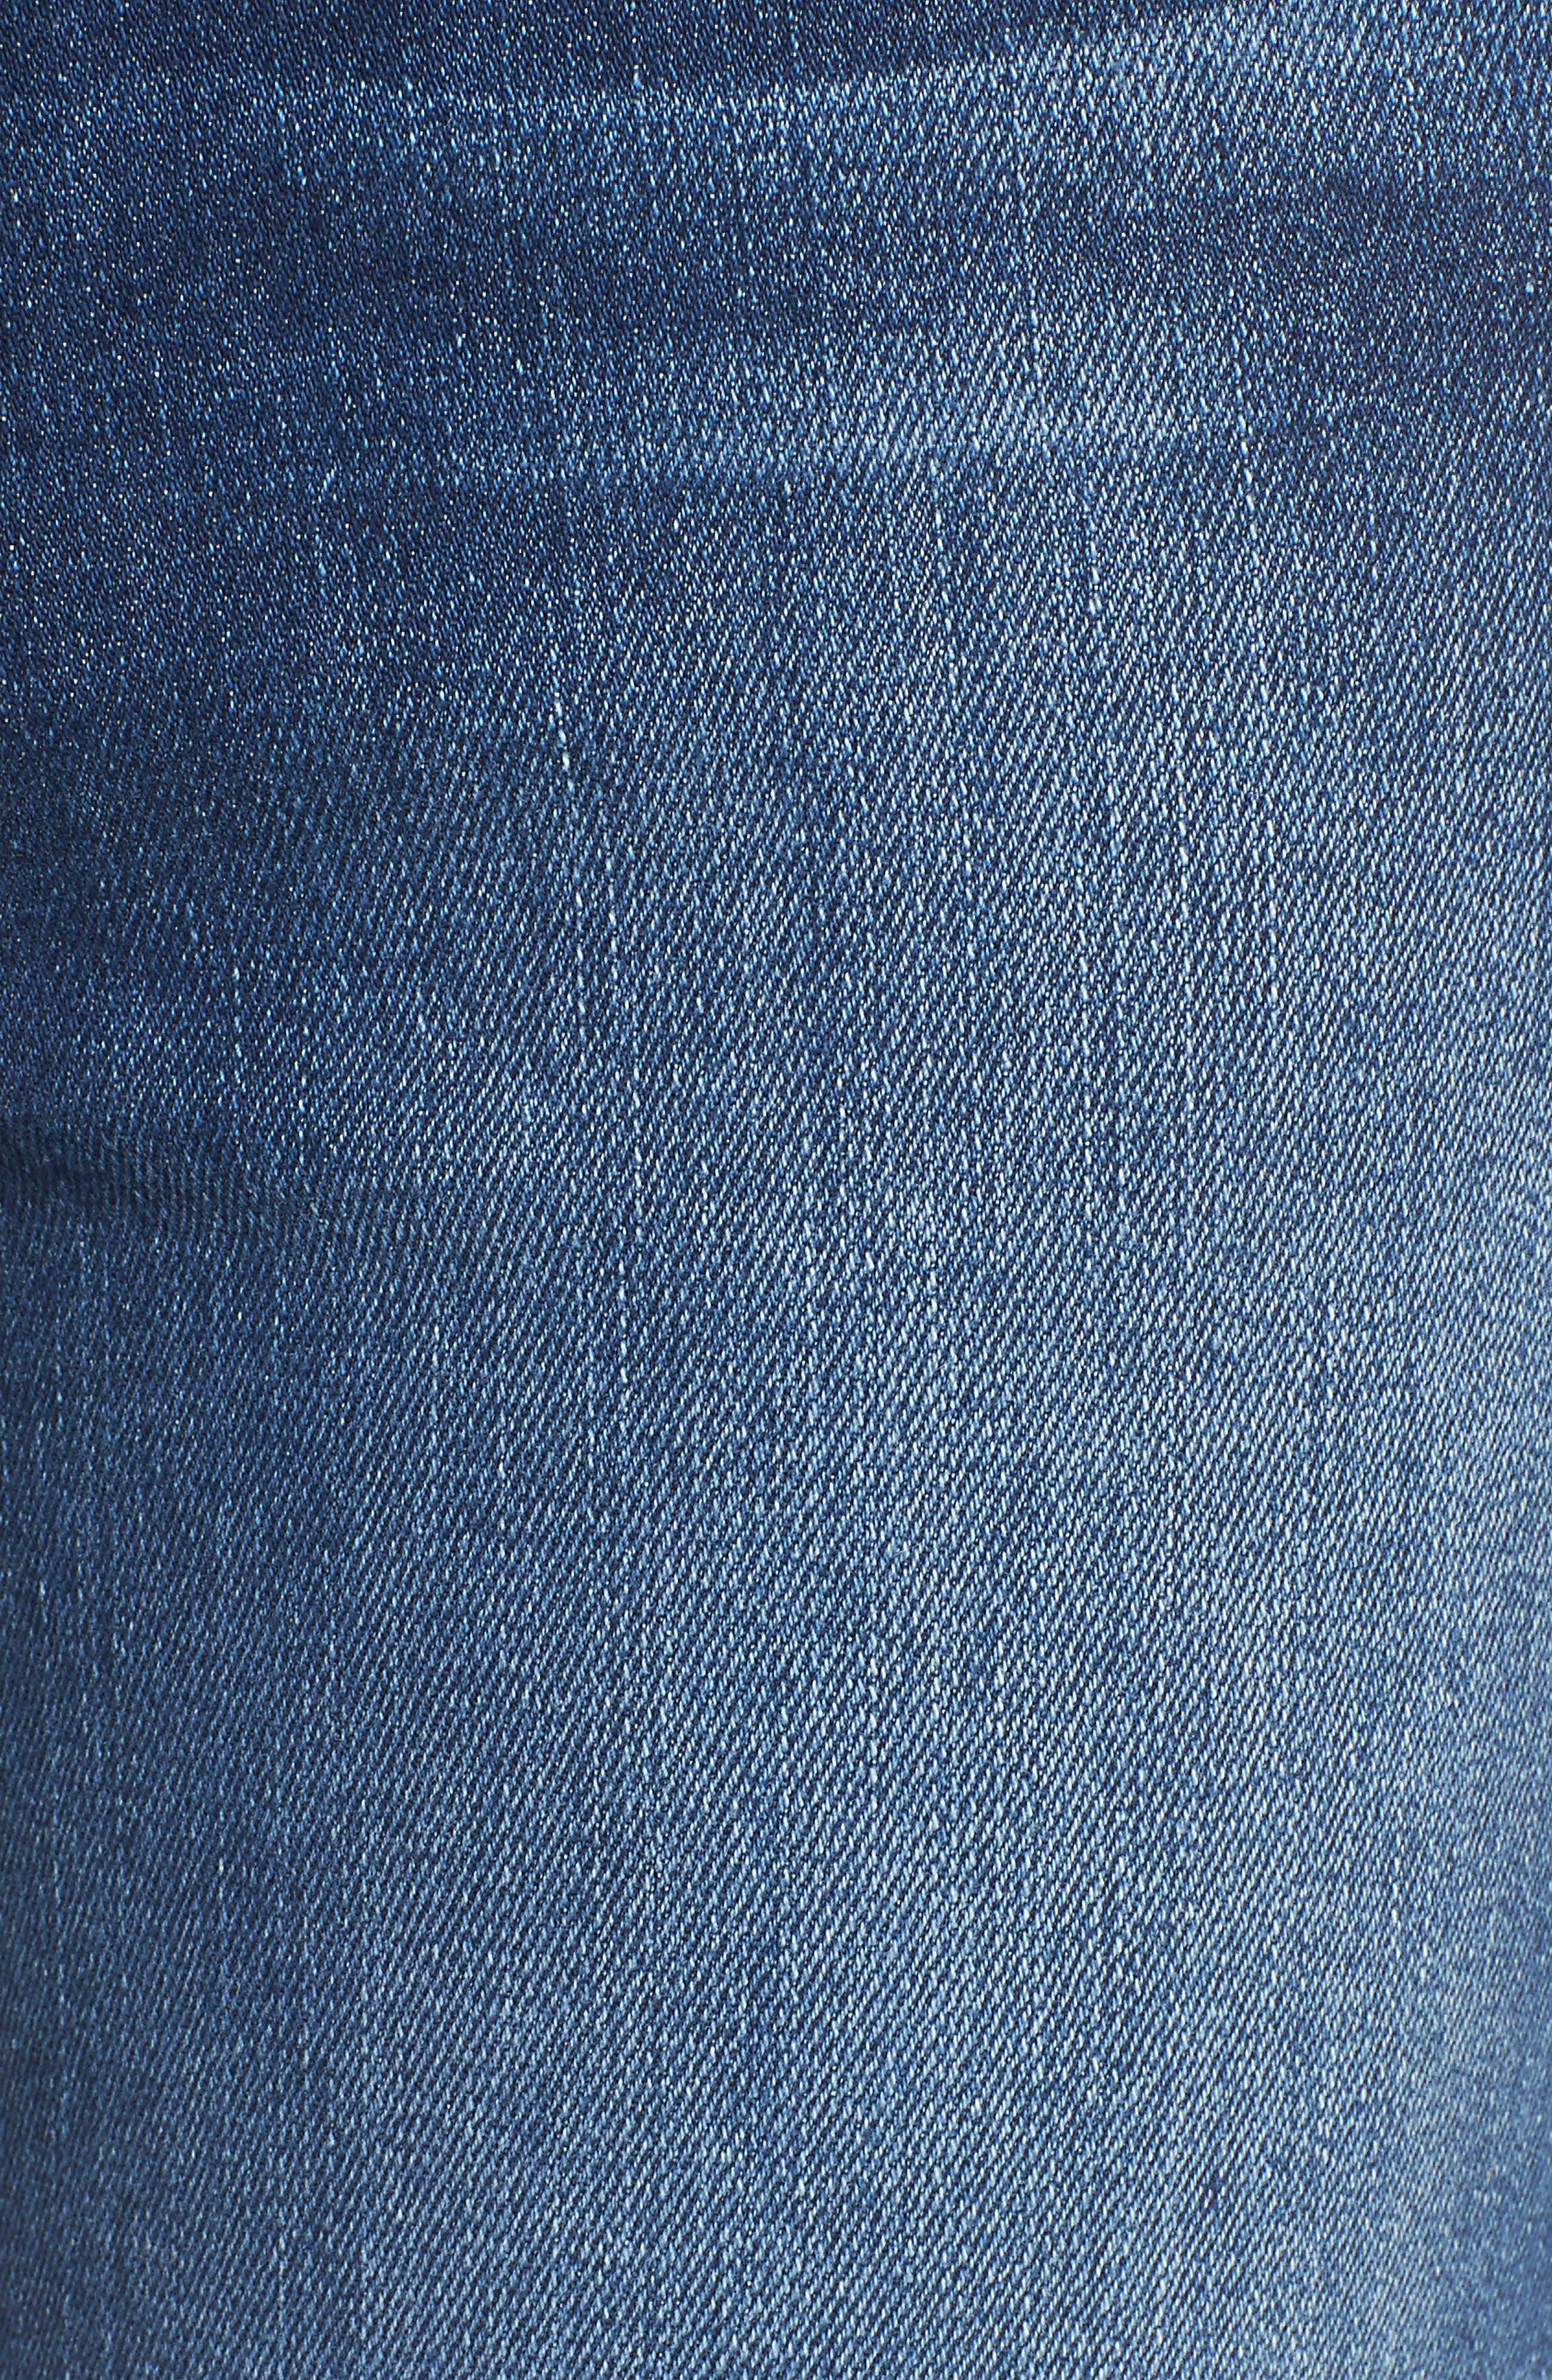 Transcend - Hoxton Ankle Straight Leg Jeans,                             Alternate thumbnail 6, color,                             Malibu